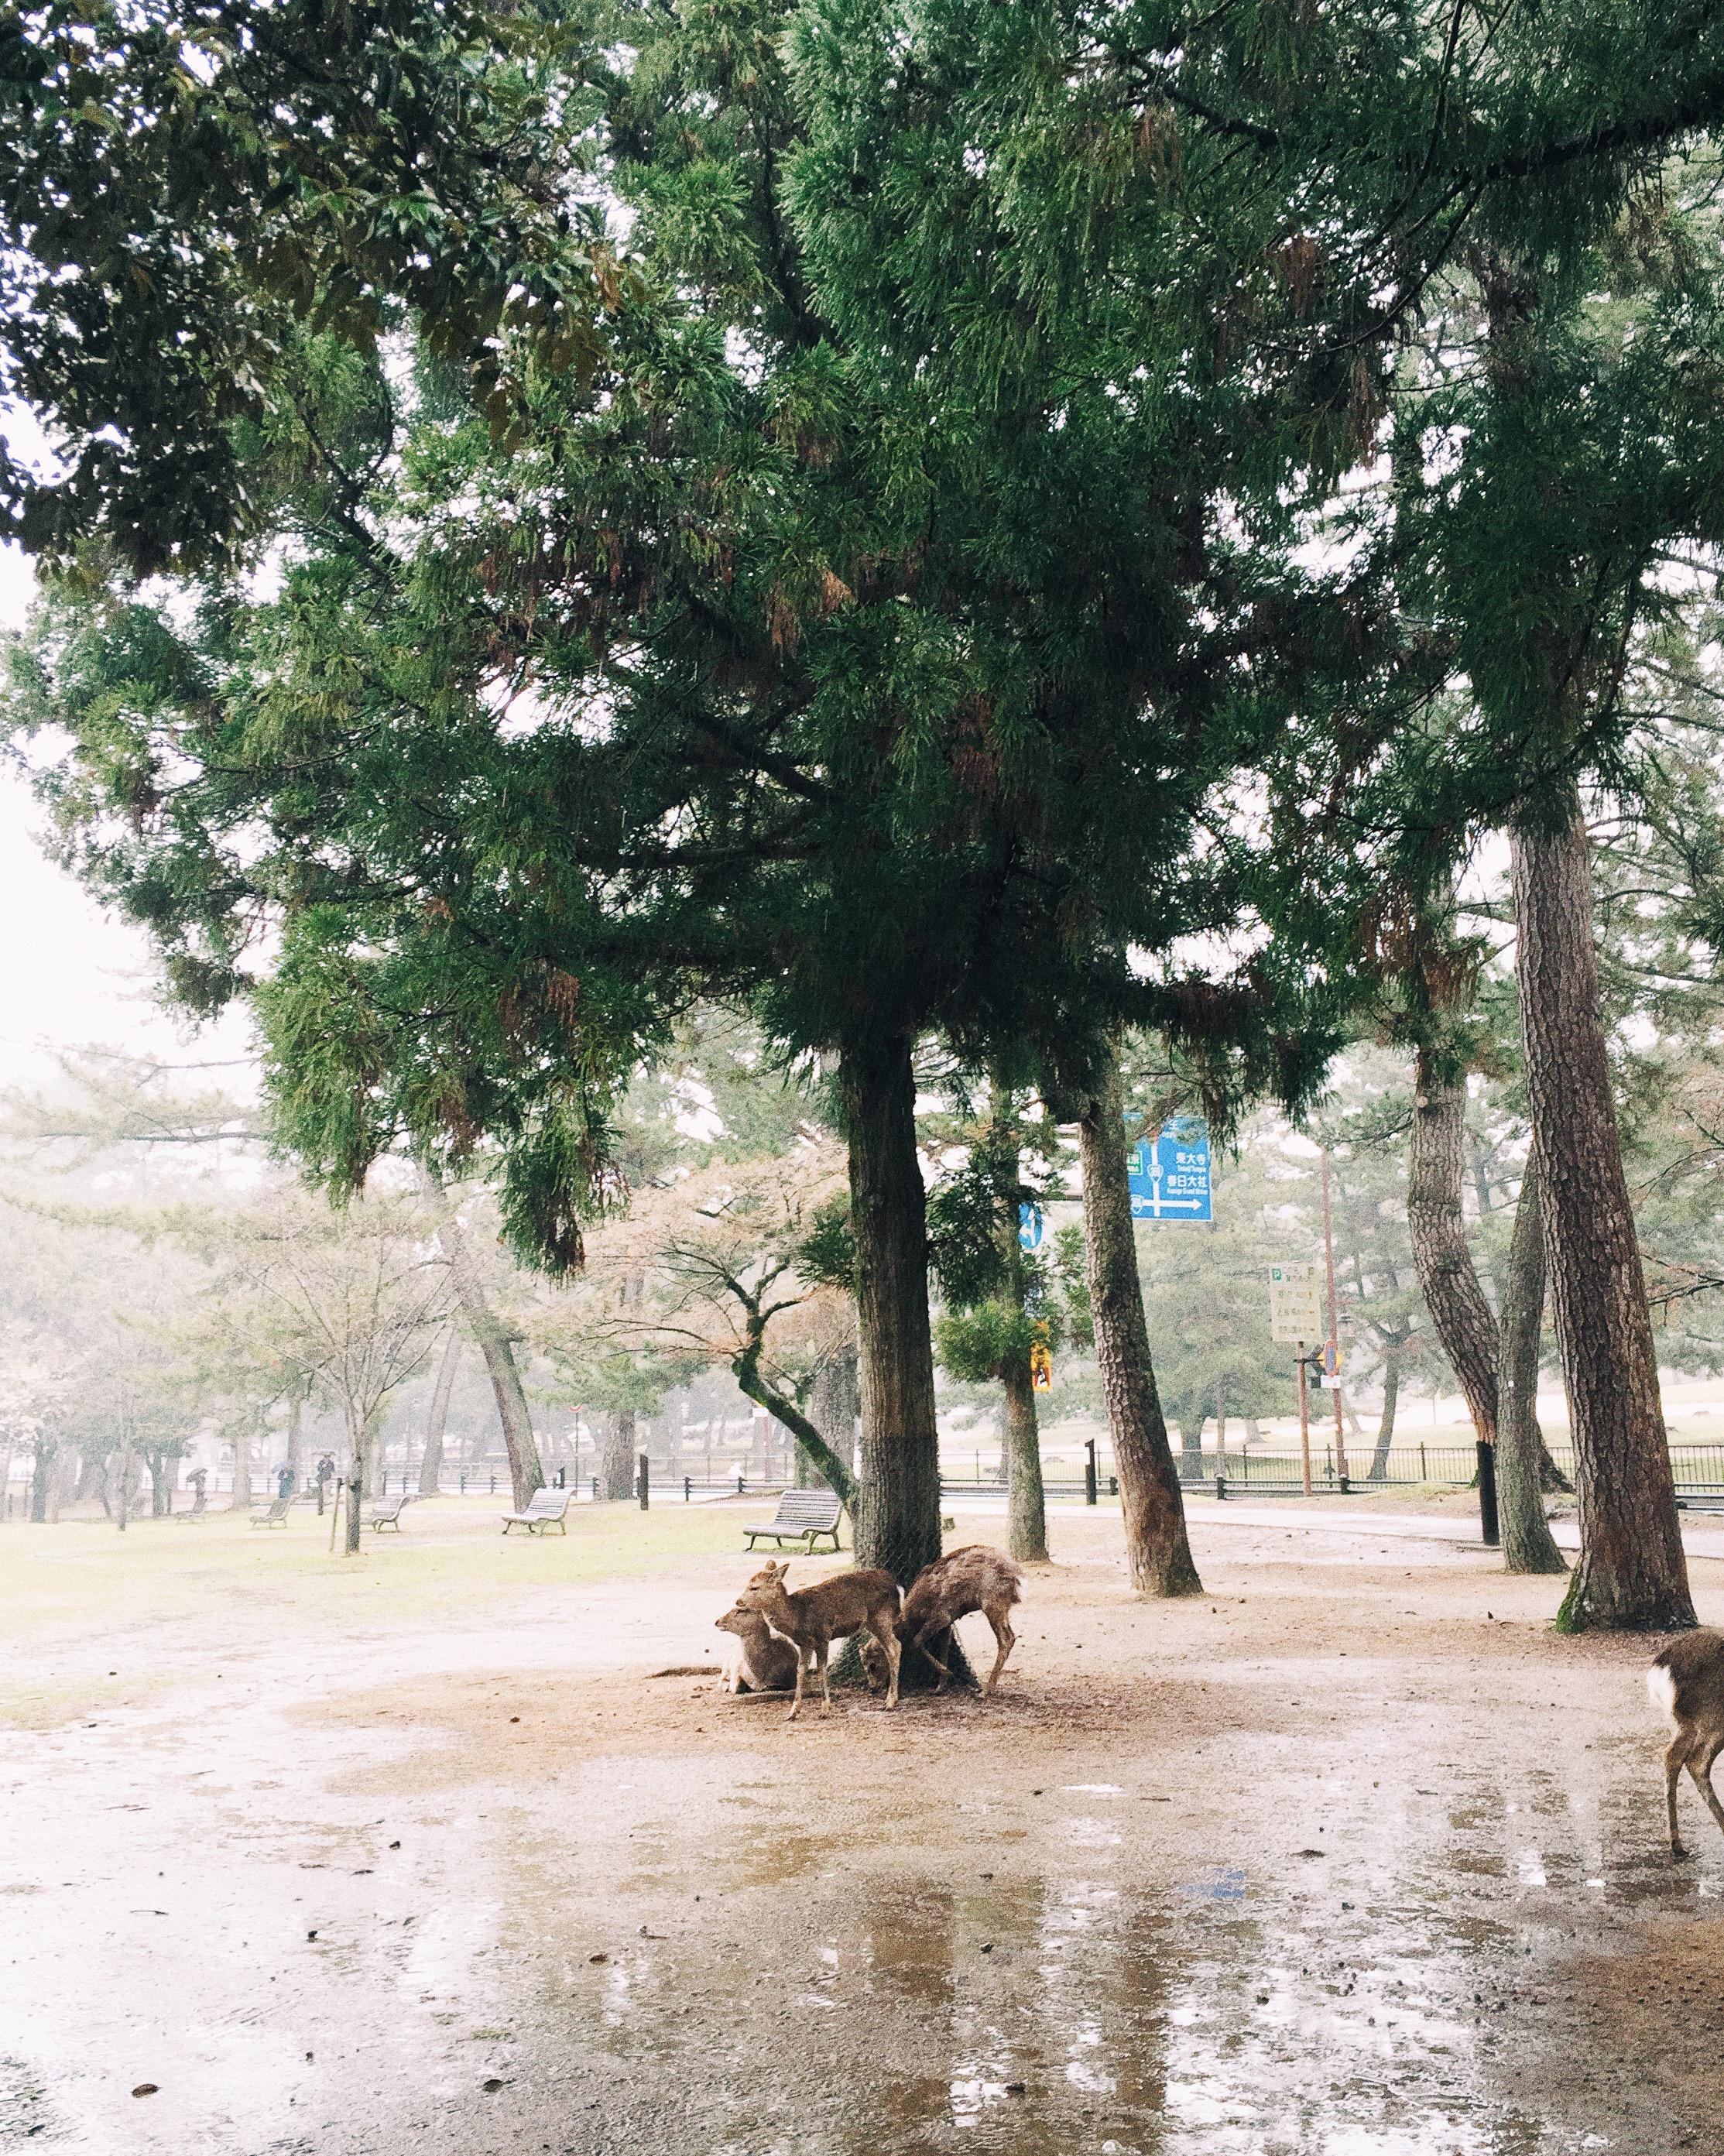 Nara Park, Spring 2015.